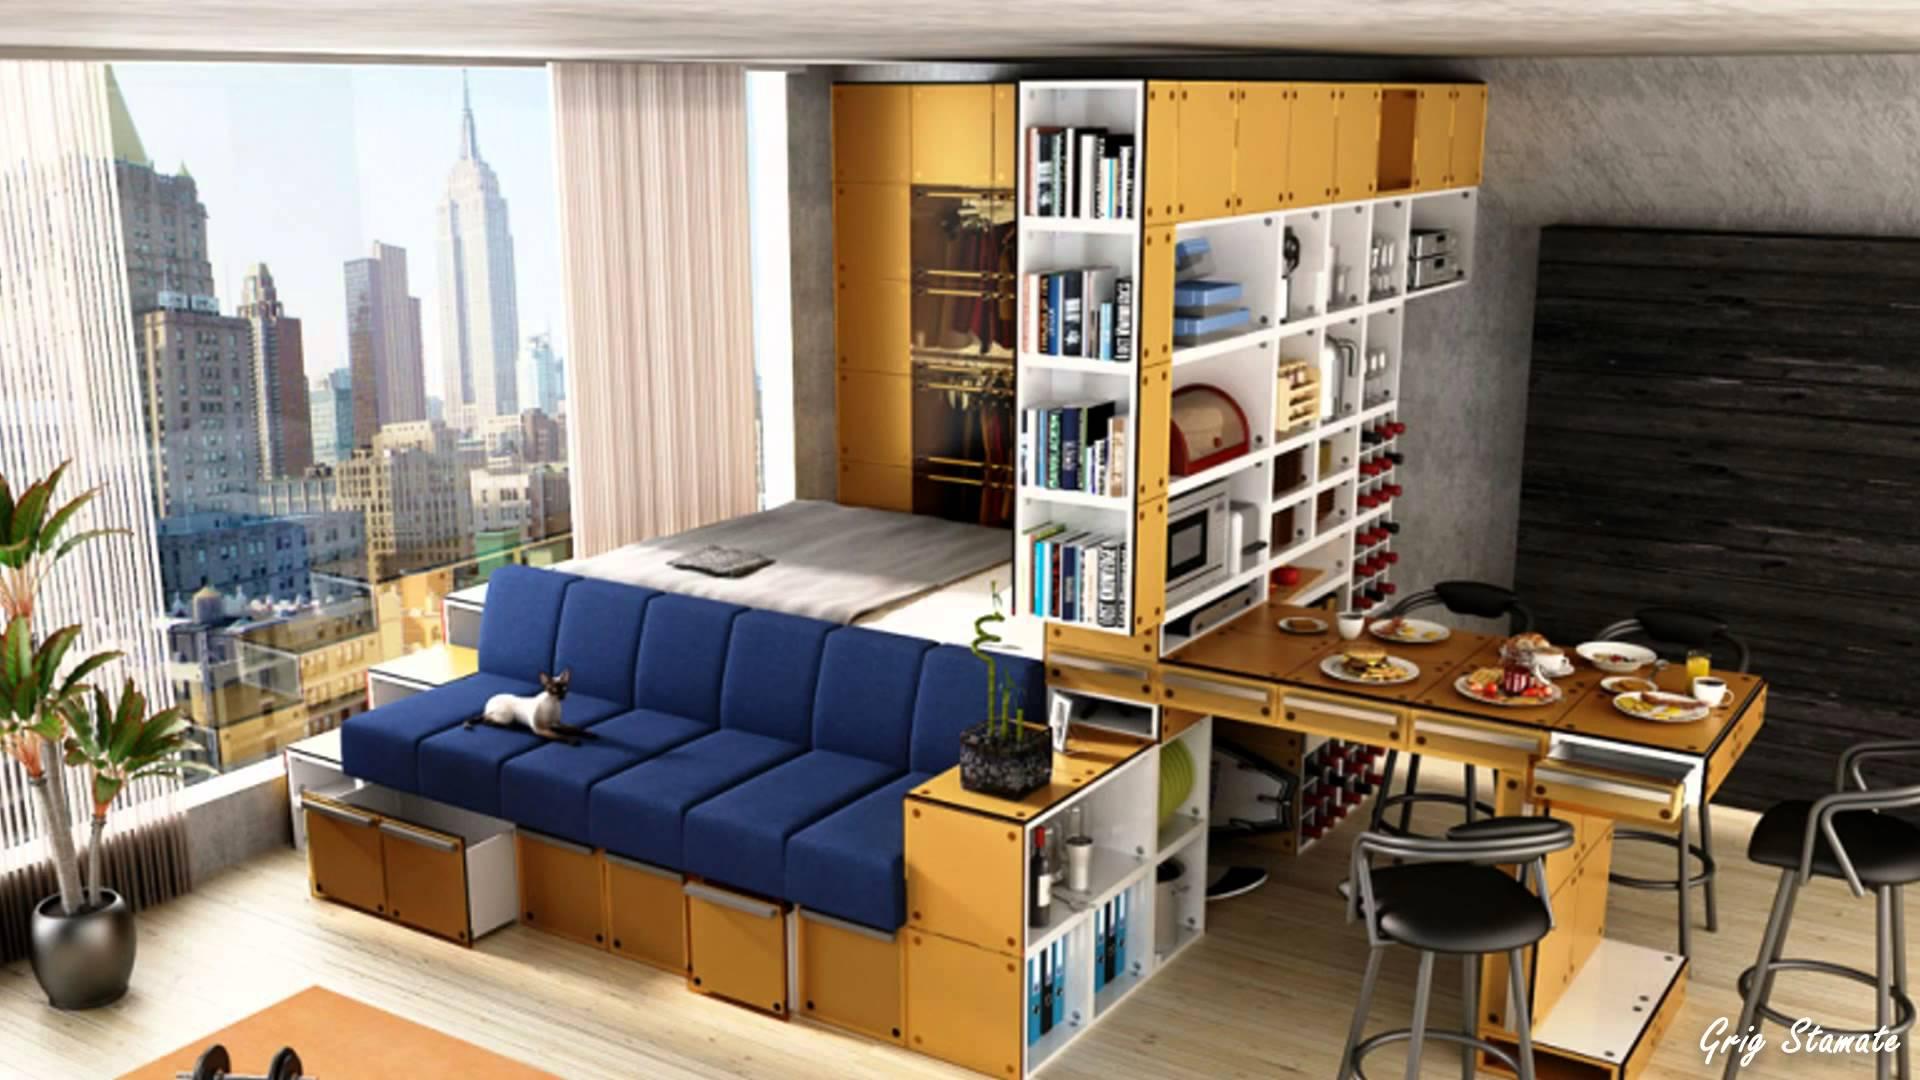 Small Apartment Design Ideas Super Small Apartment Interior Design Ideas  Happho